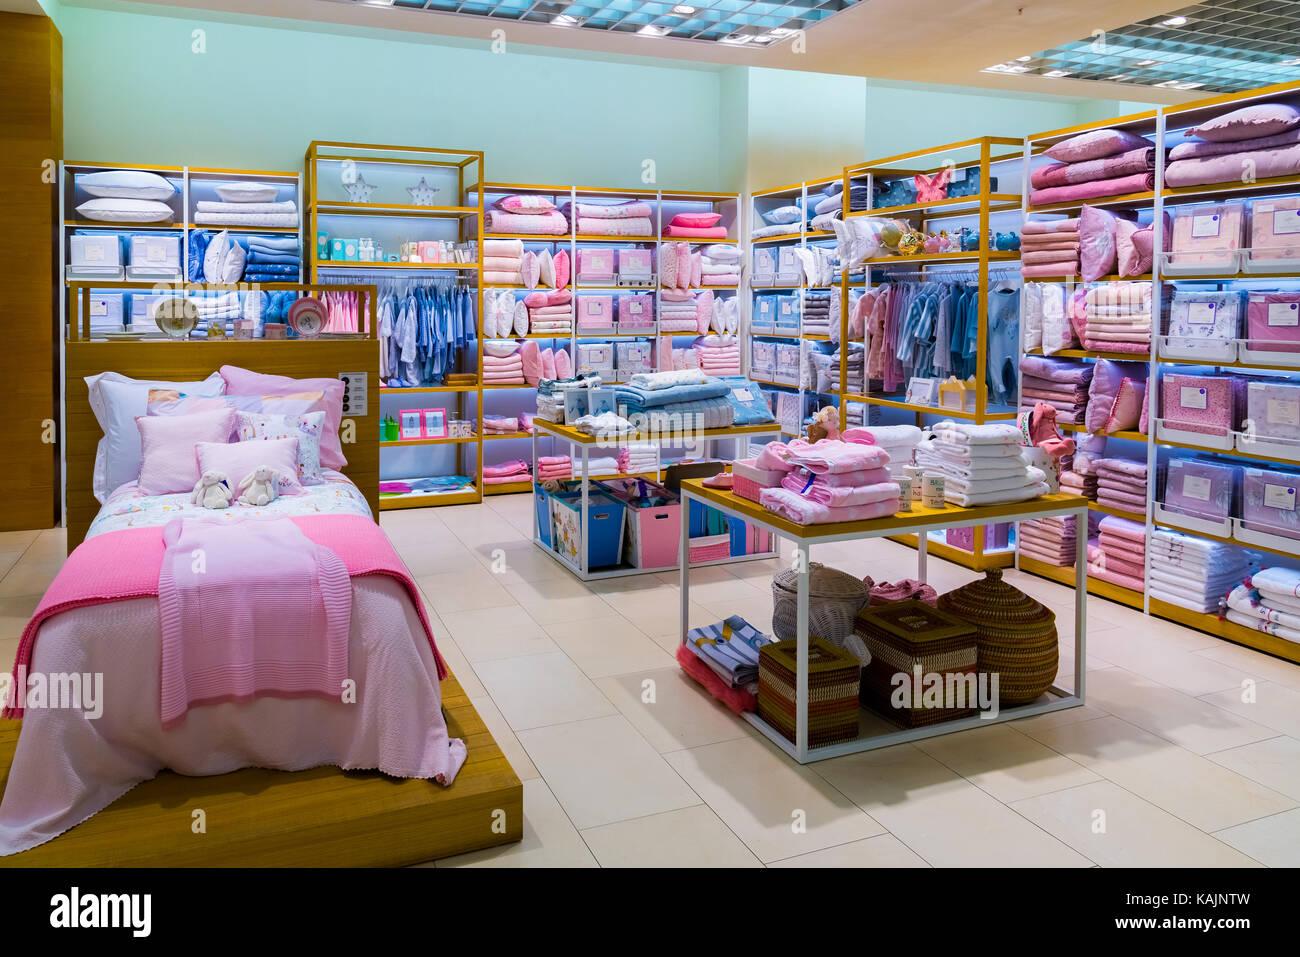 zara shop inside stock photos zara shop inside stock images alamy. Black Bedroom Furniture Sets. Home Design Ideas